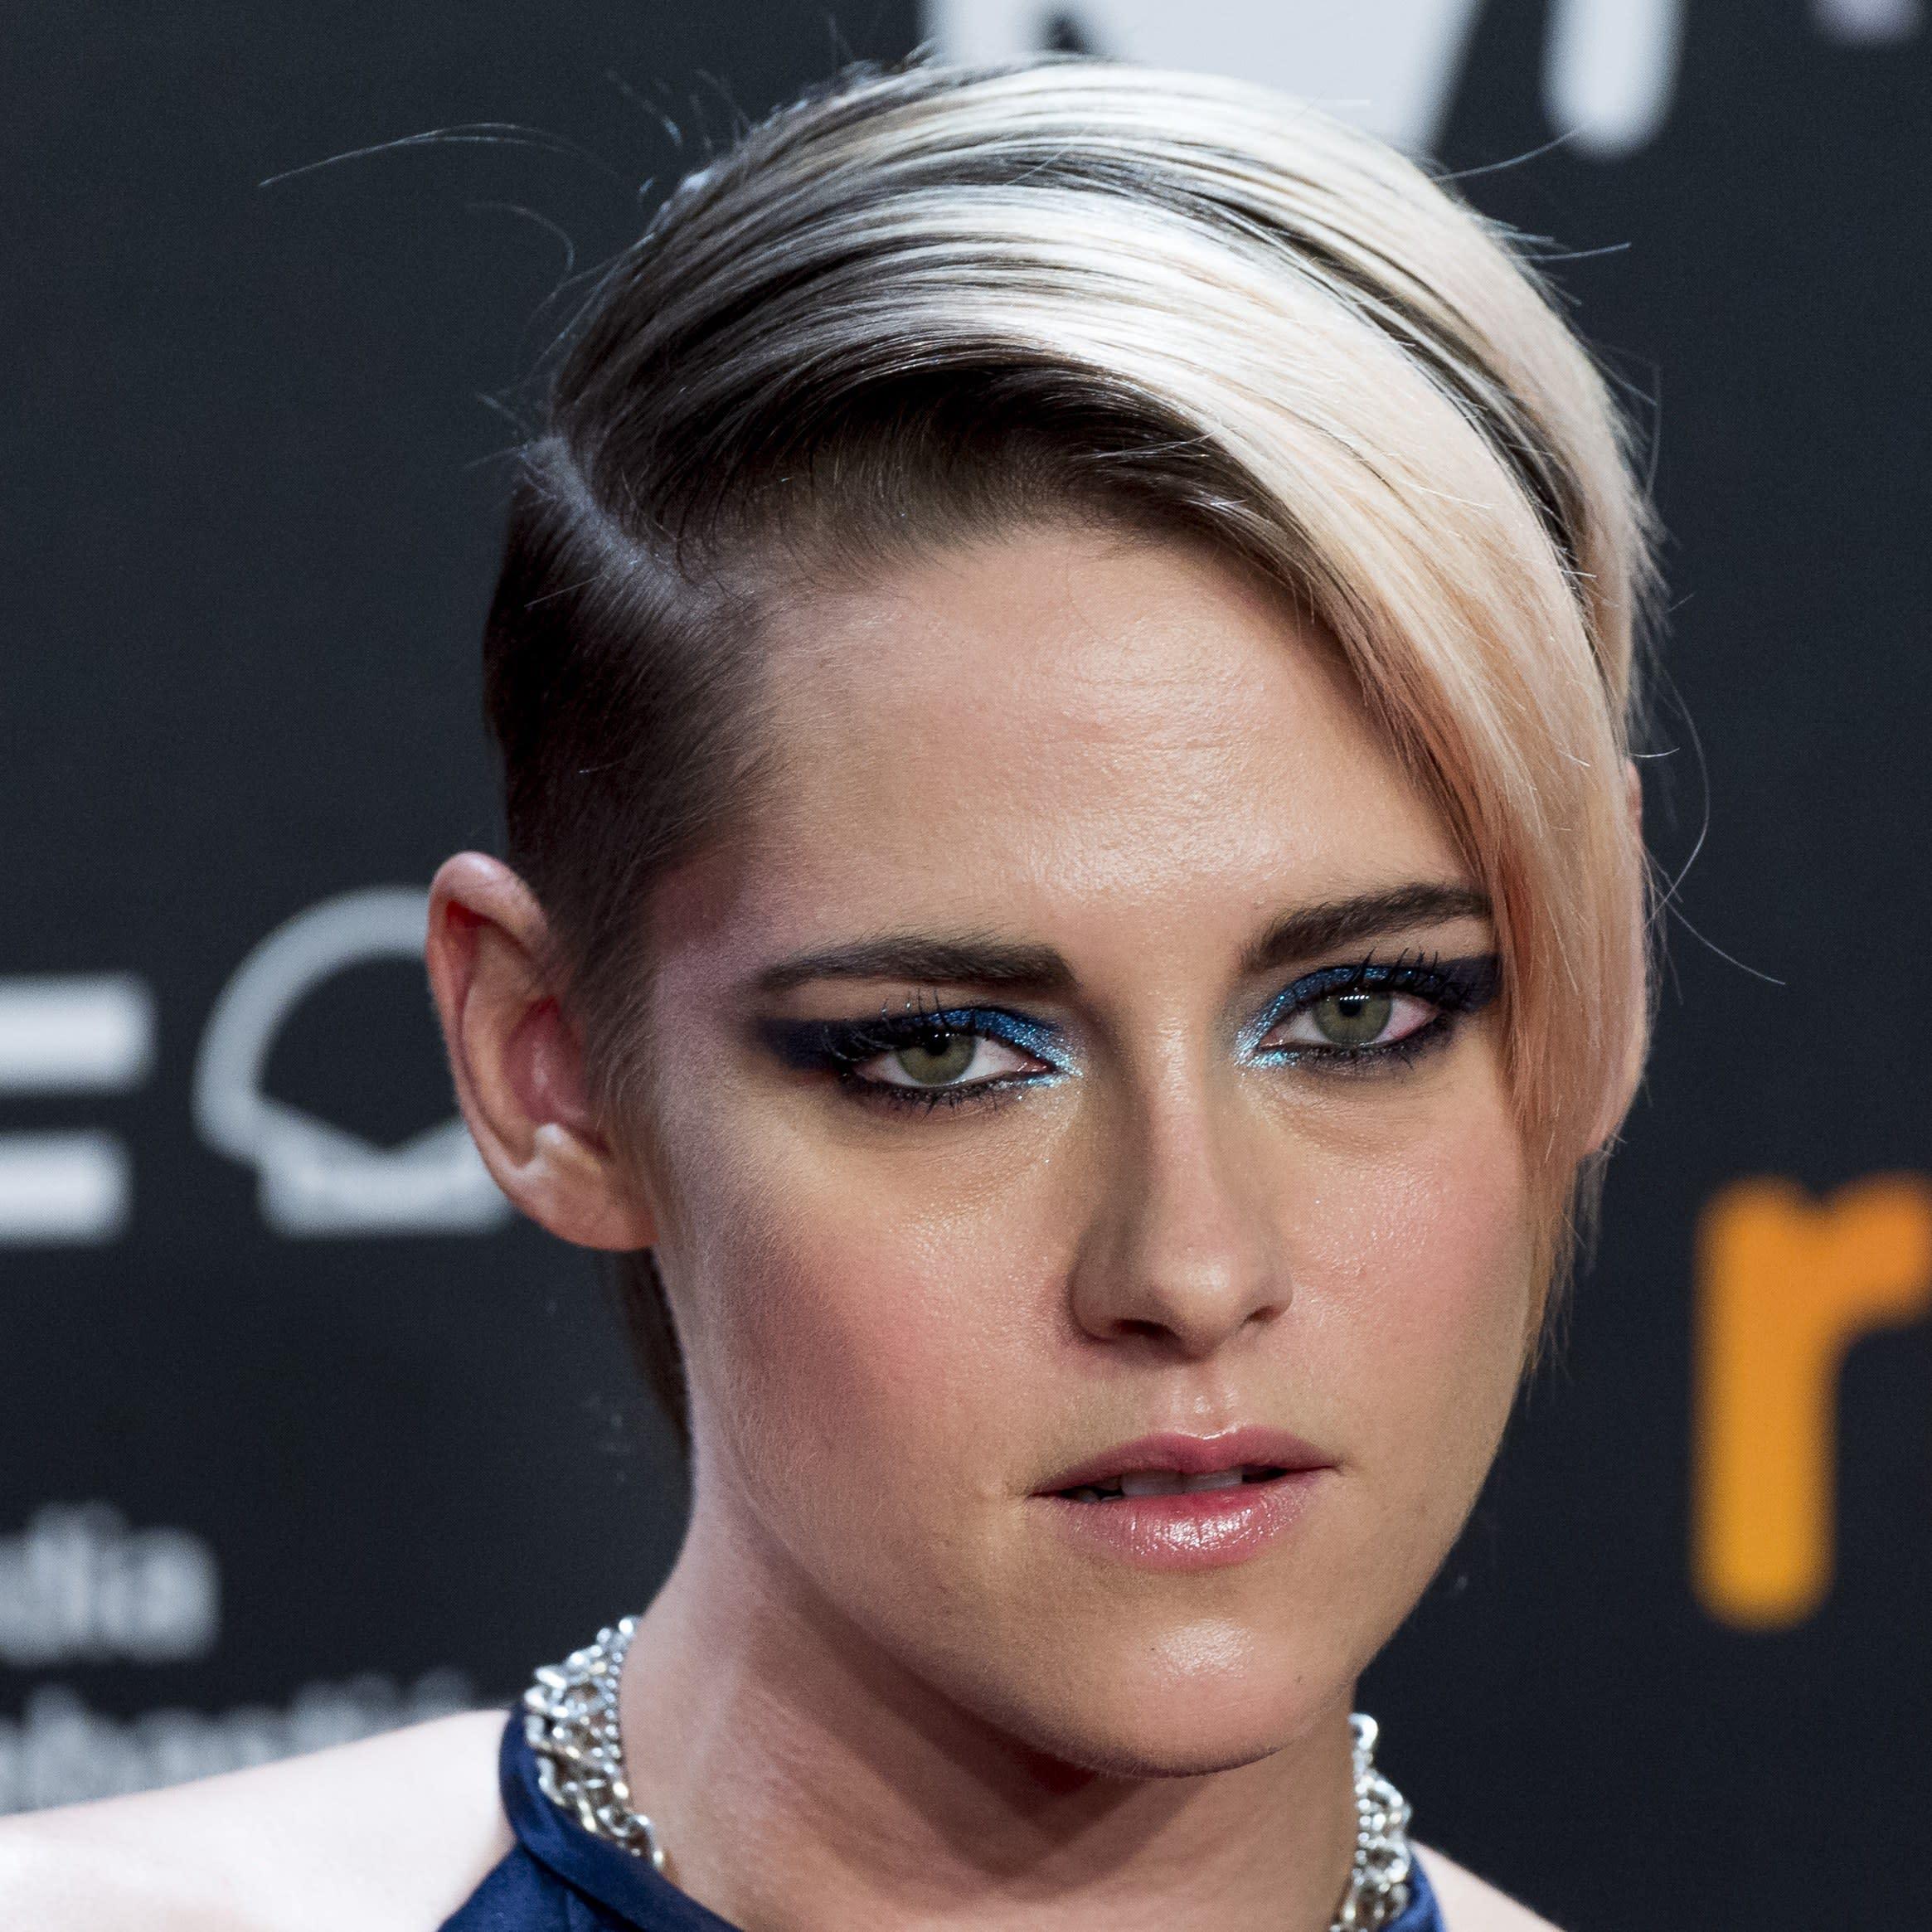 Kristen Stewart Showcases 16 Different Ways To Wear A Short Haircut